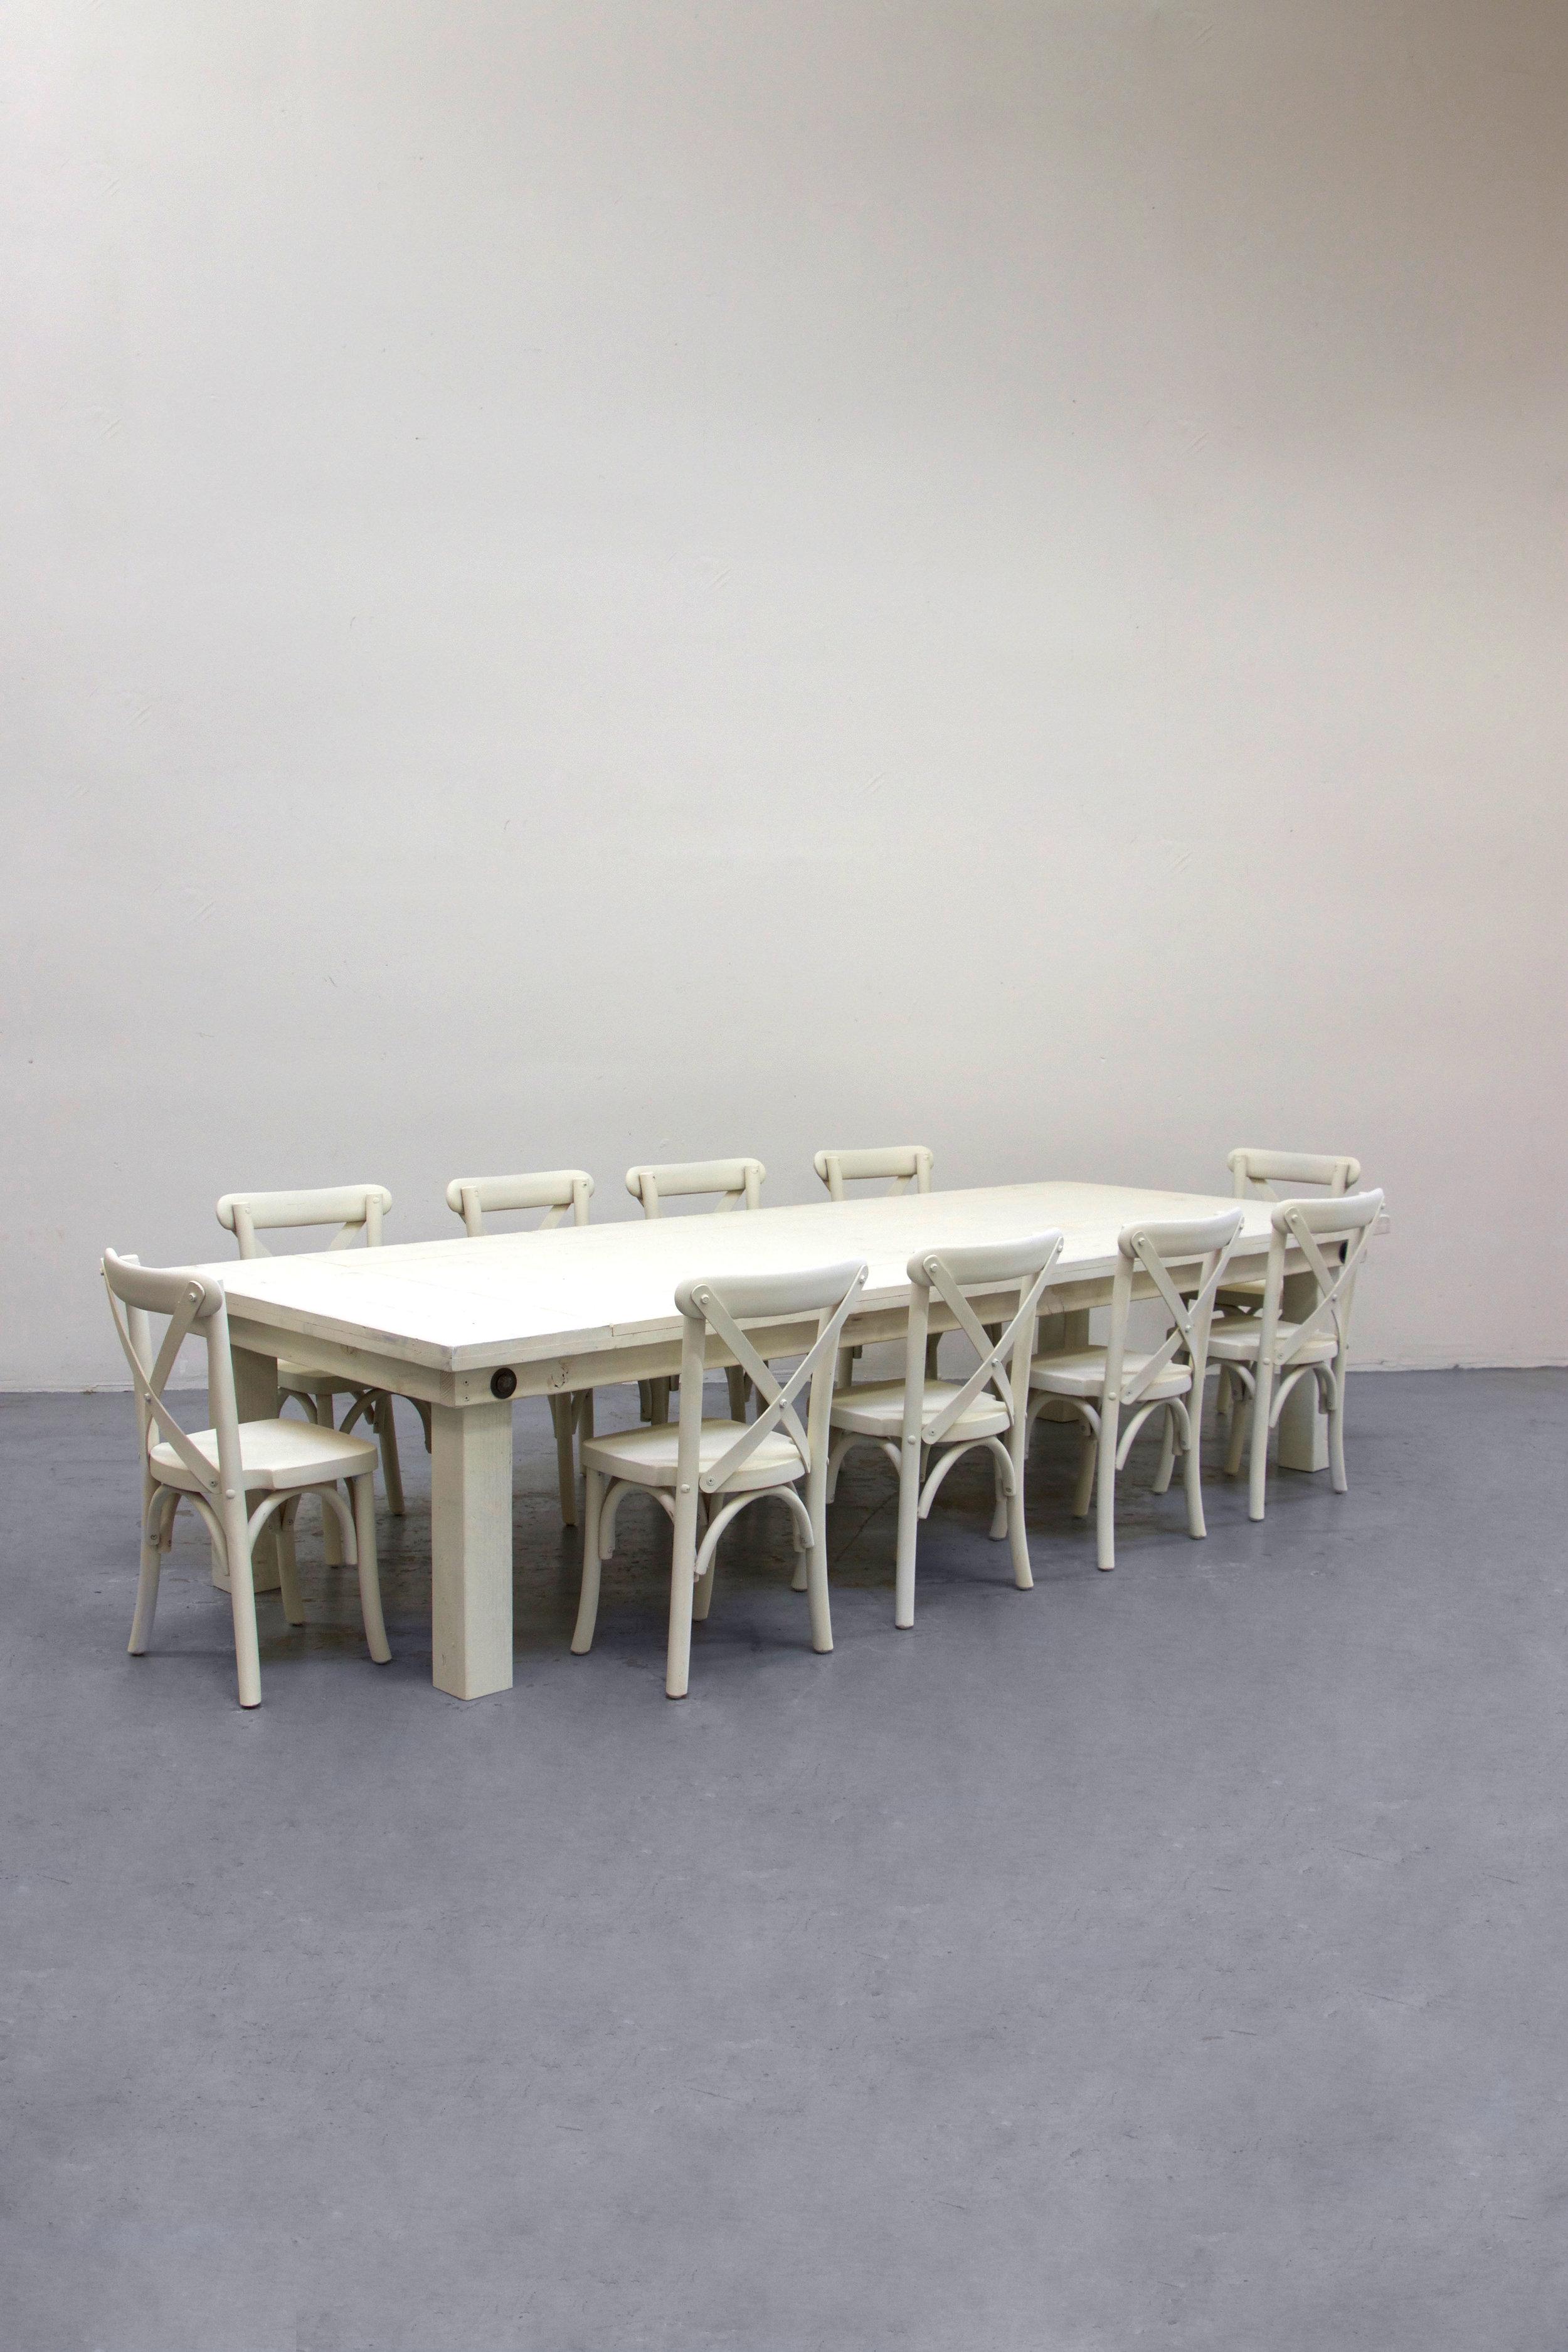 $140 1 Kids Vintage White Farm Table w/ 10 Cross-Back Chairs